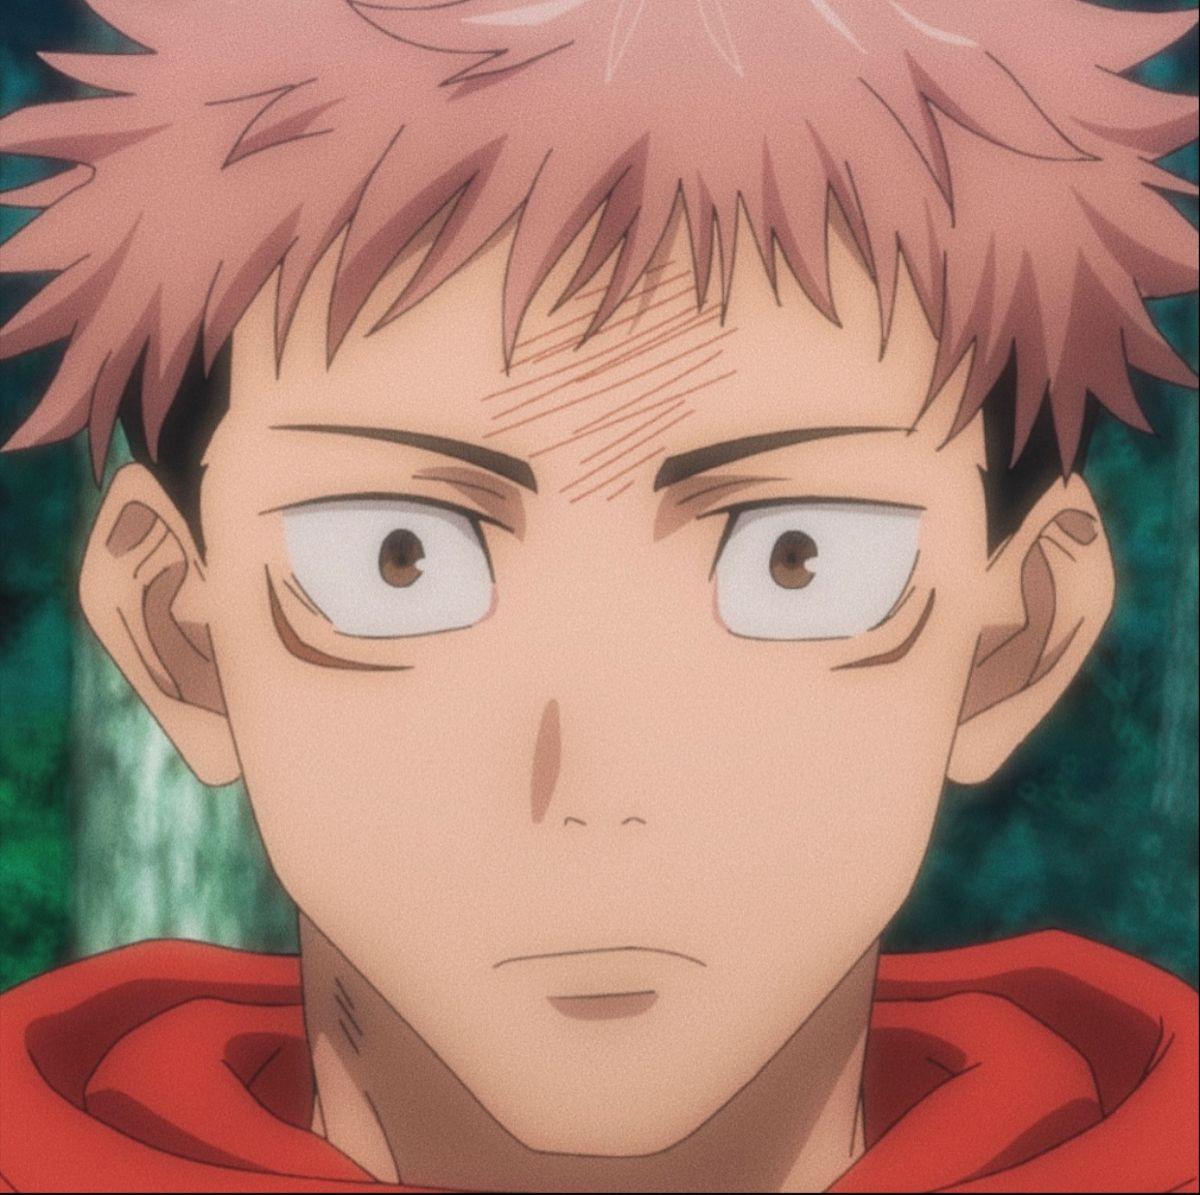 Yuji Itadori Icon In 2021 Anime Anime Icons Art